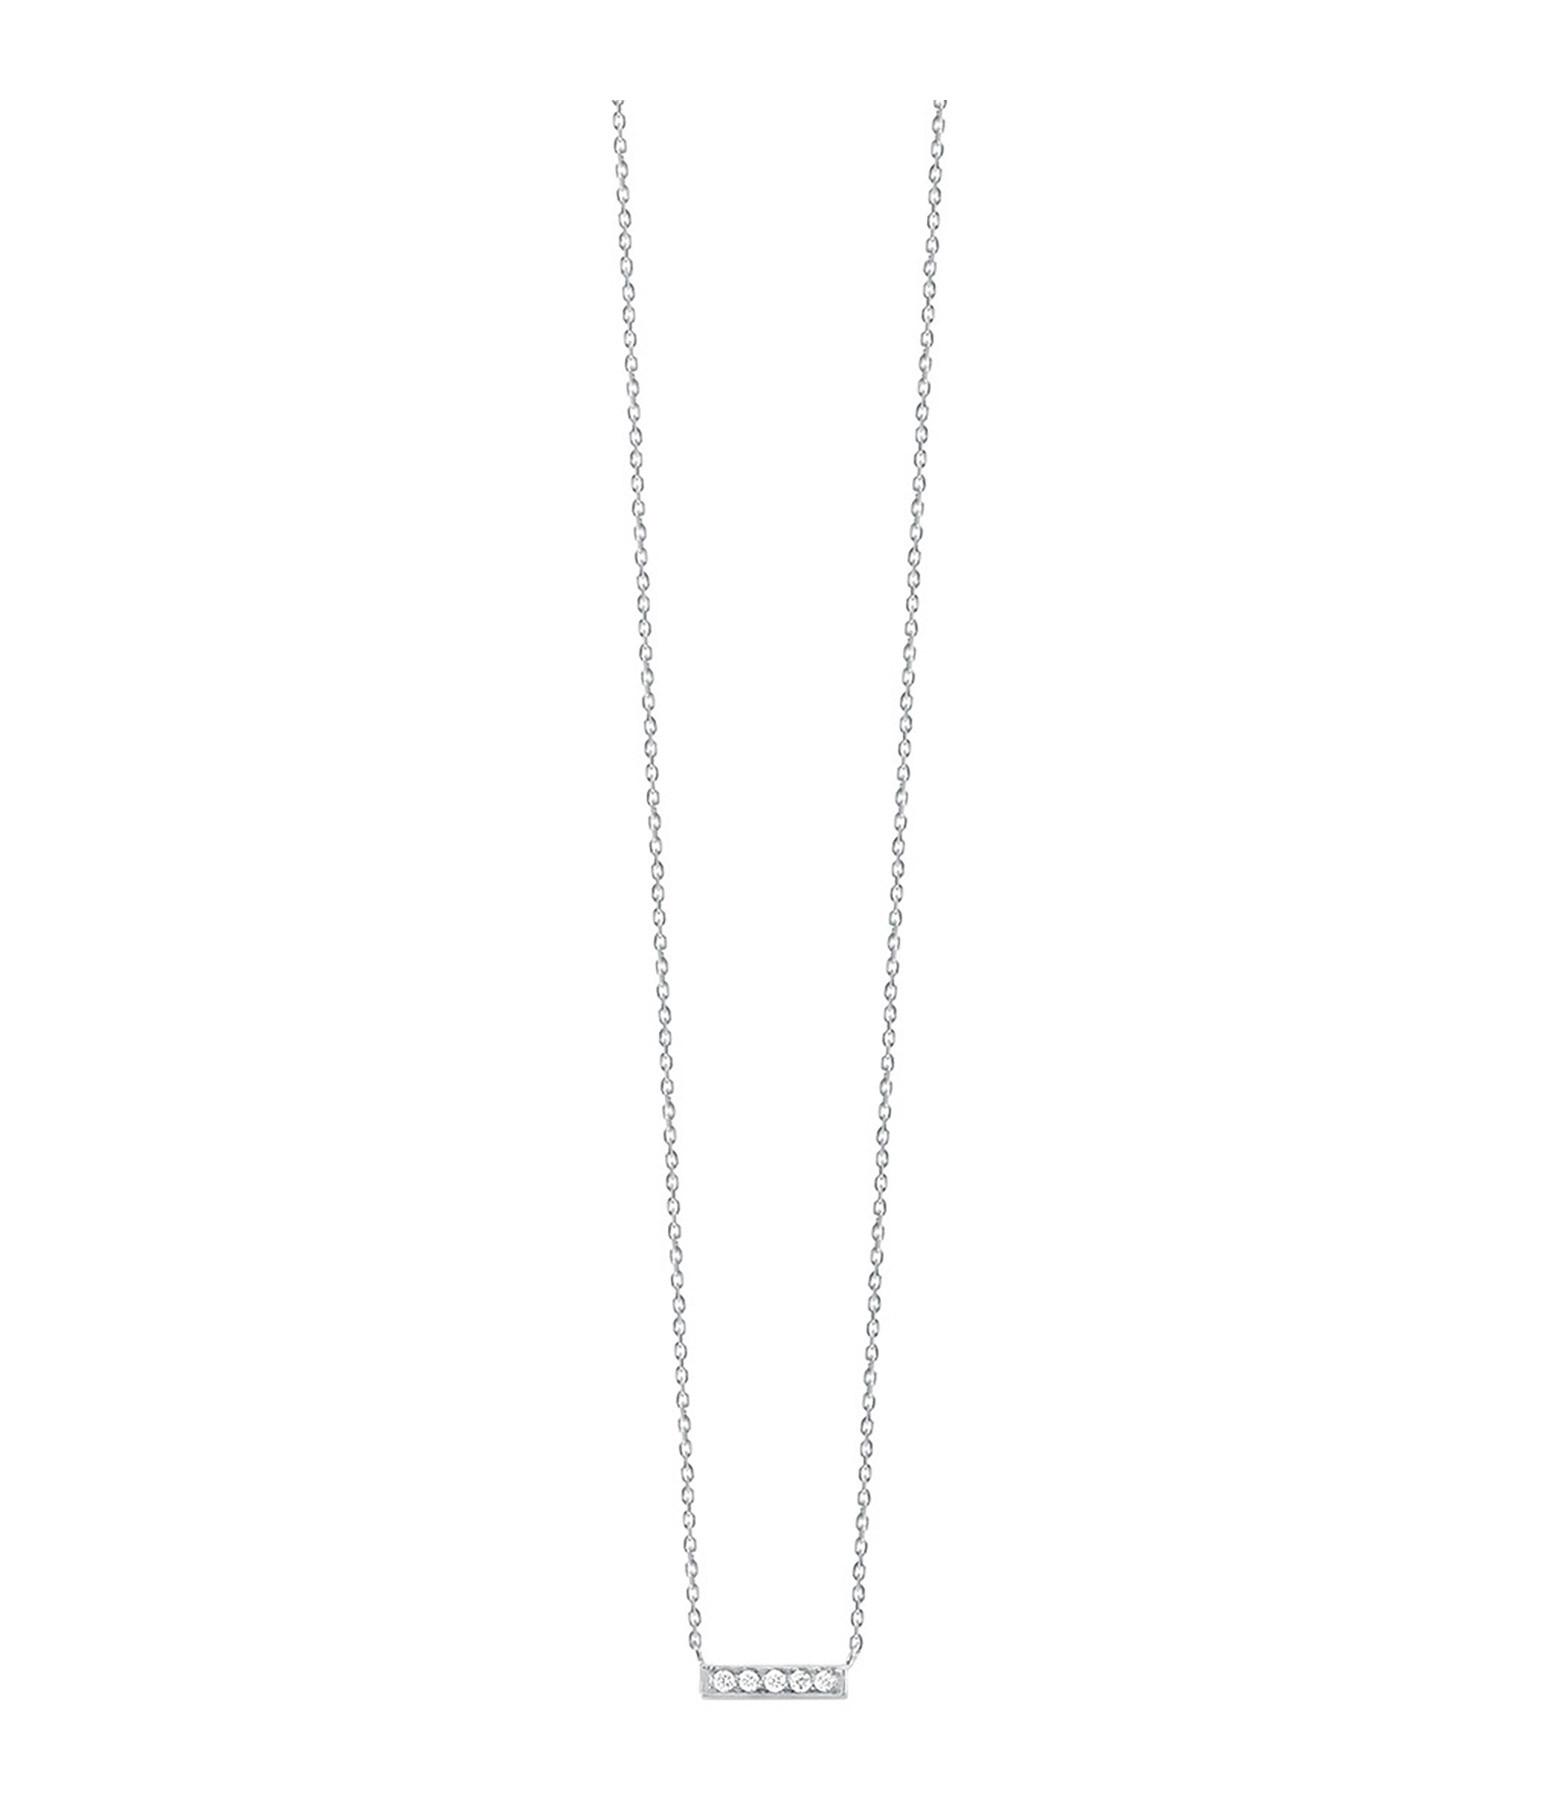 VANRYCKE - Collier Medellin PM Or Blanc Diamants